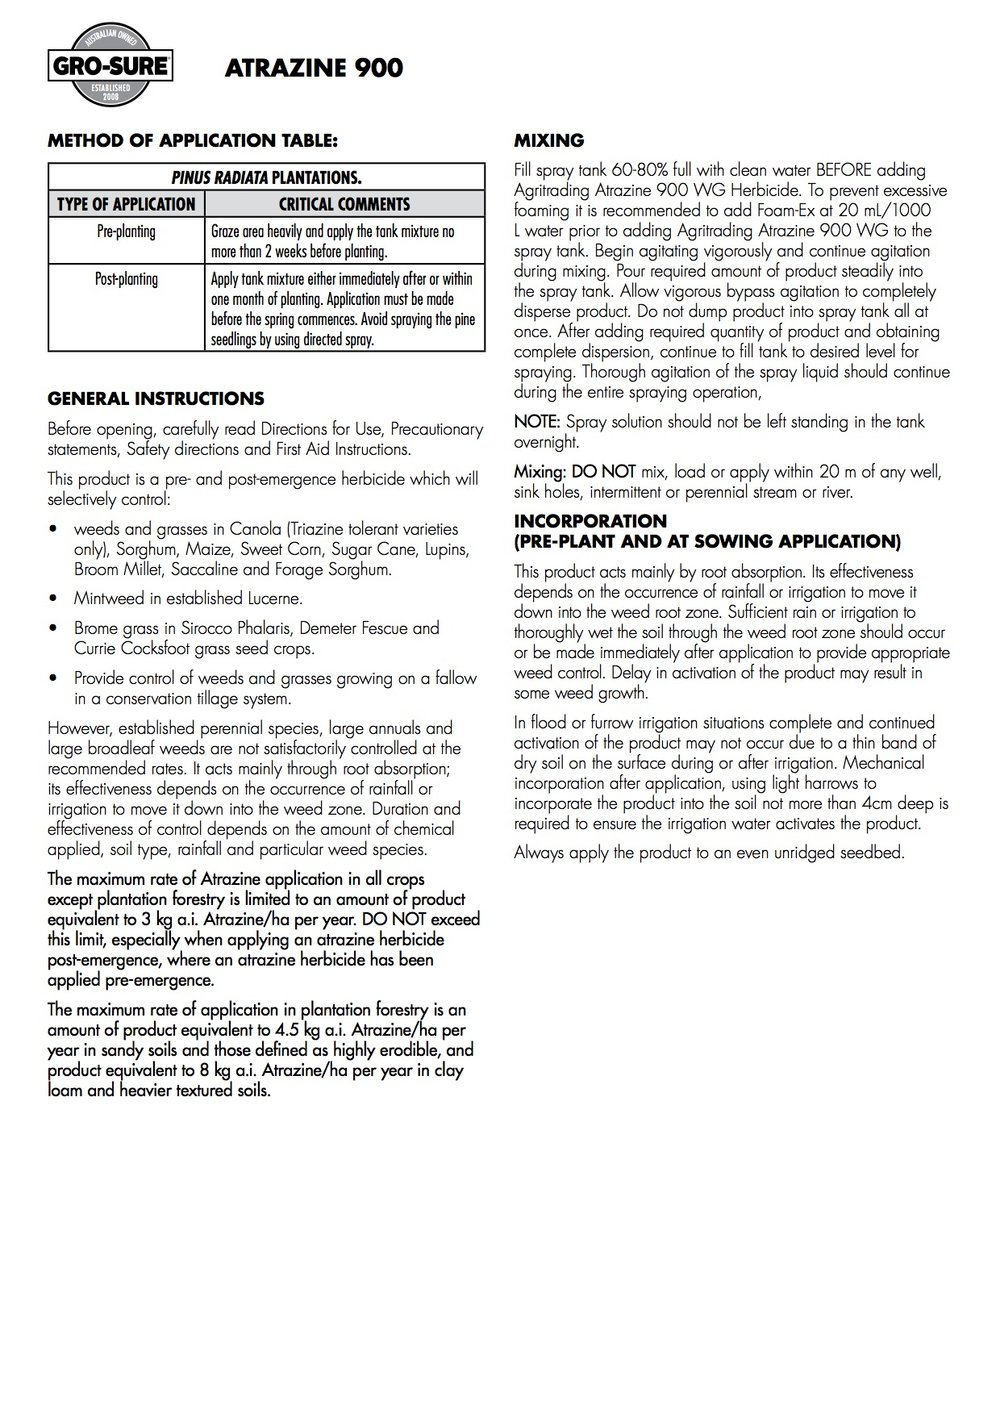 Atrazine 900 Web Label copy6.jpg